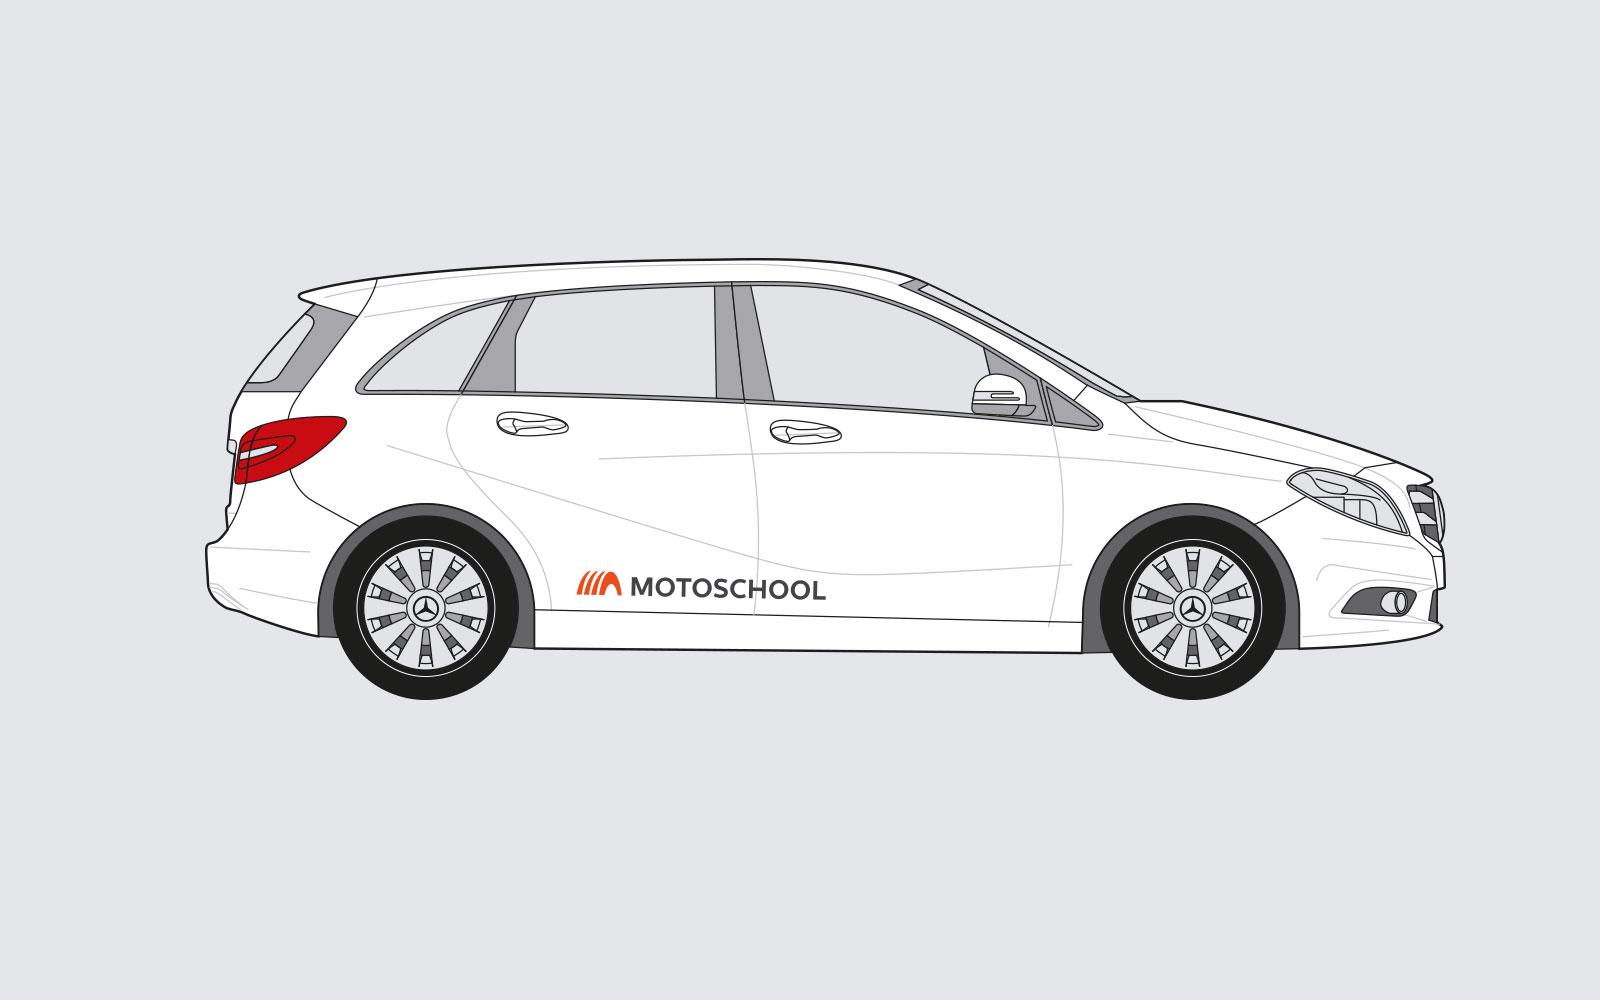 motoschool_1600p_Fahrzeug